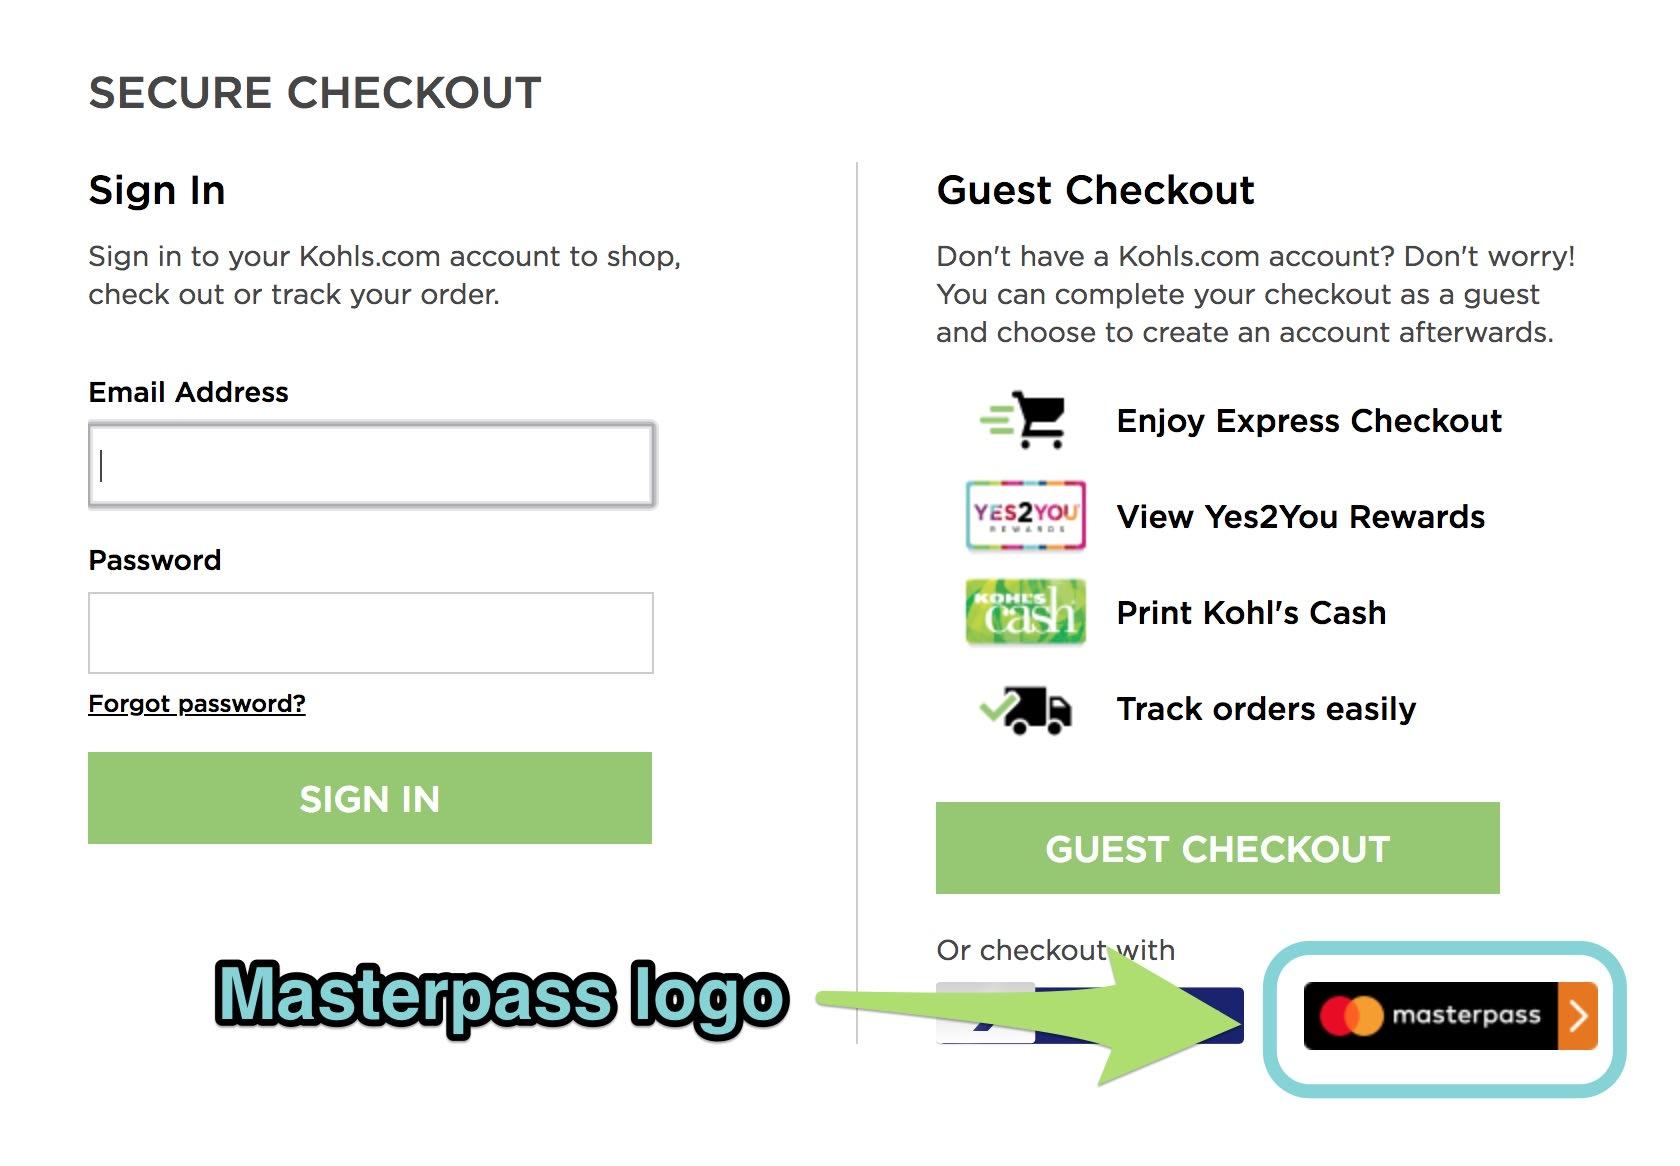 The Masterpass logo at checkout.